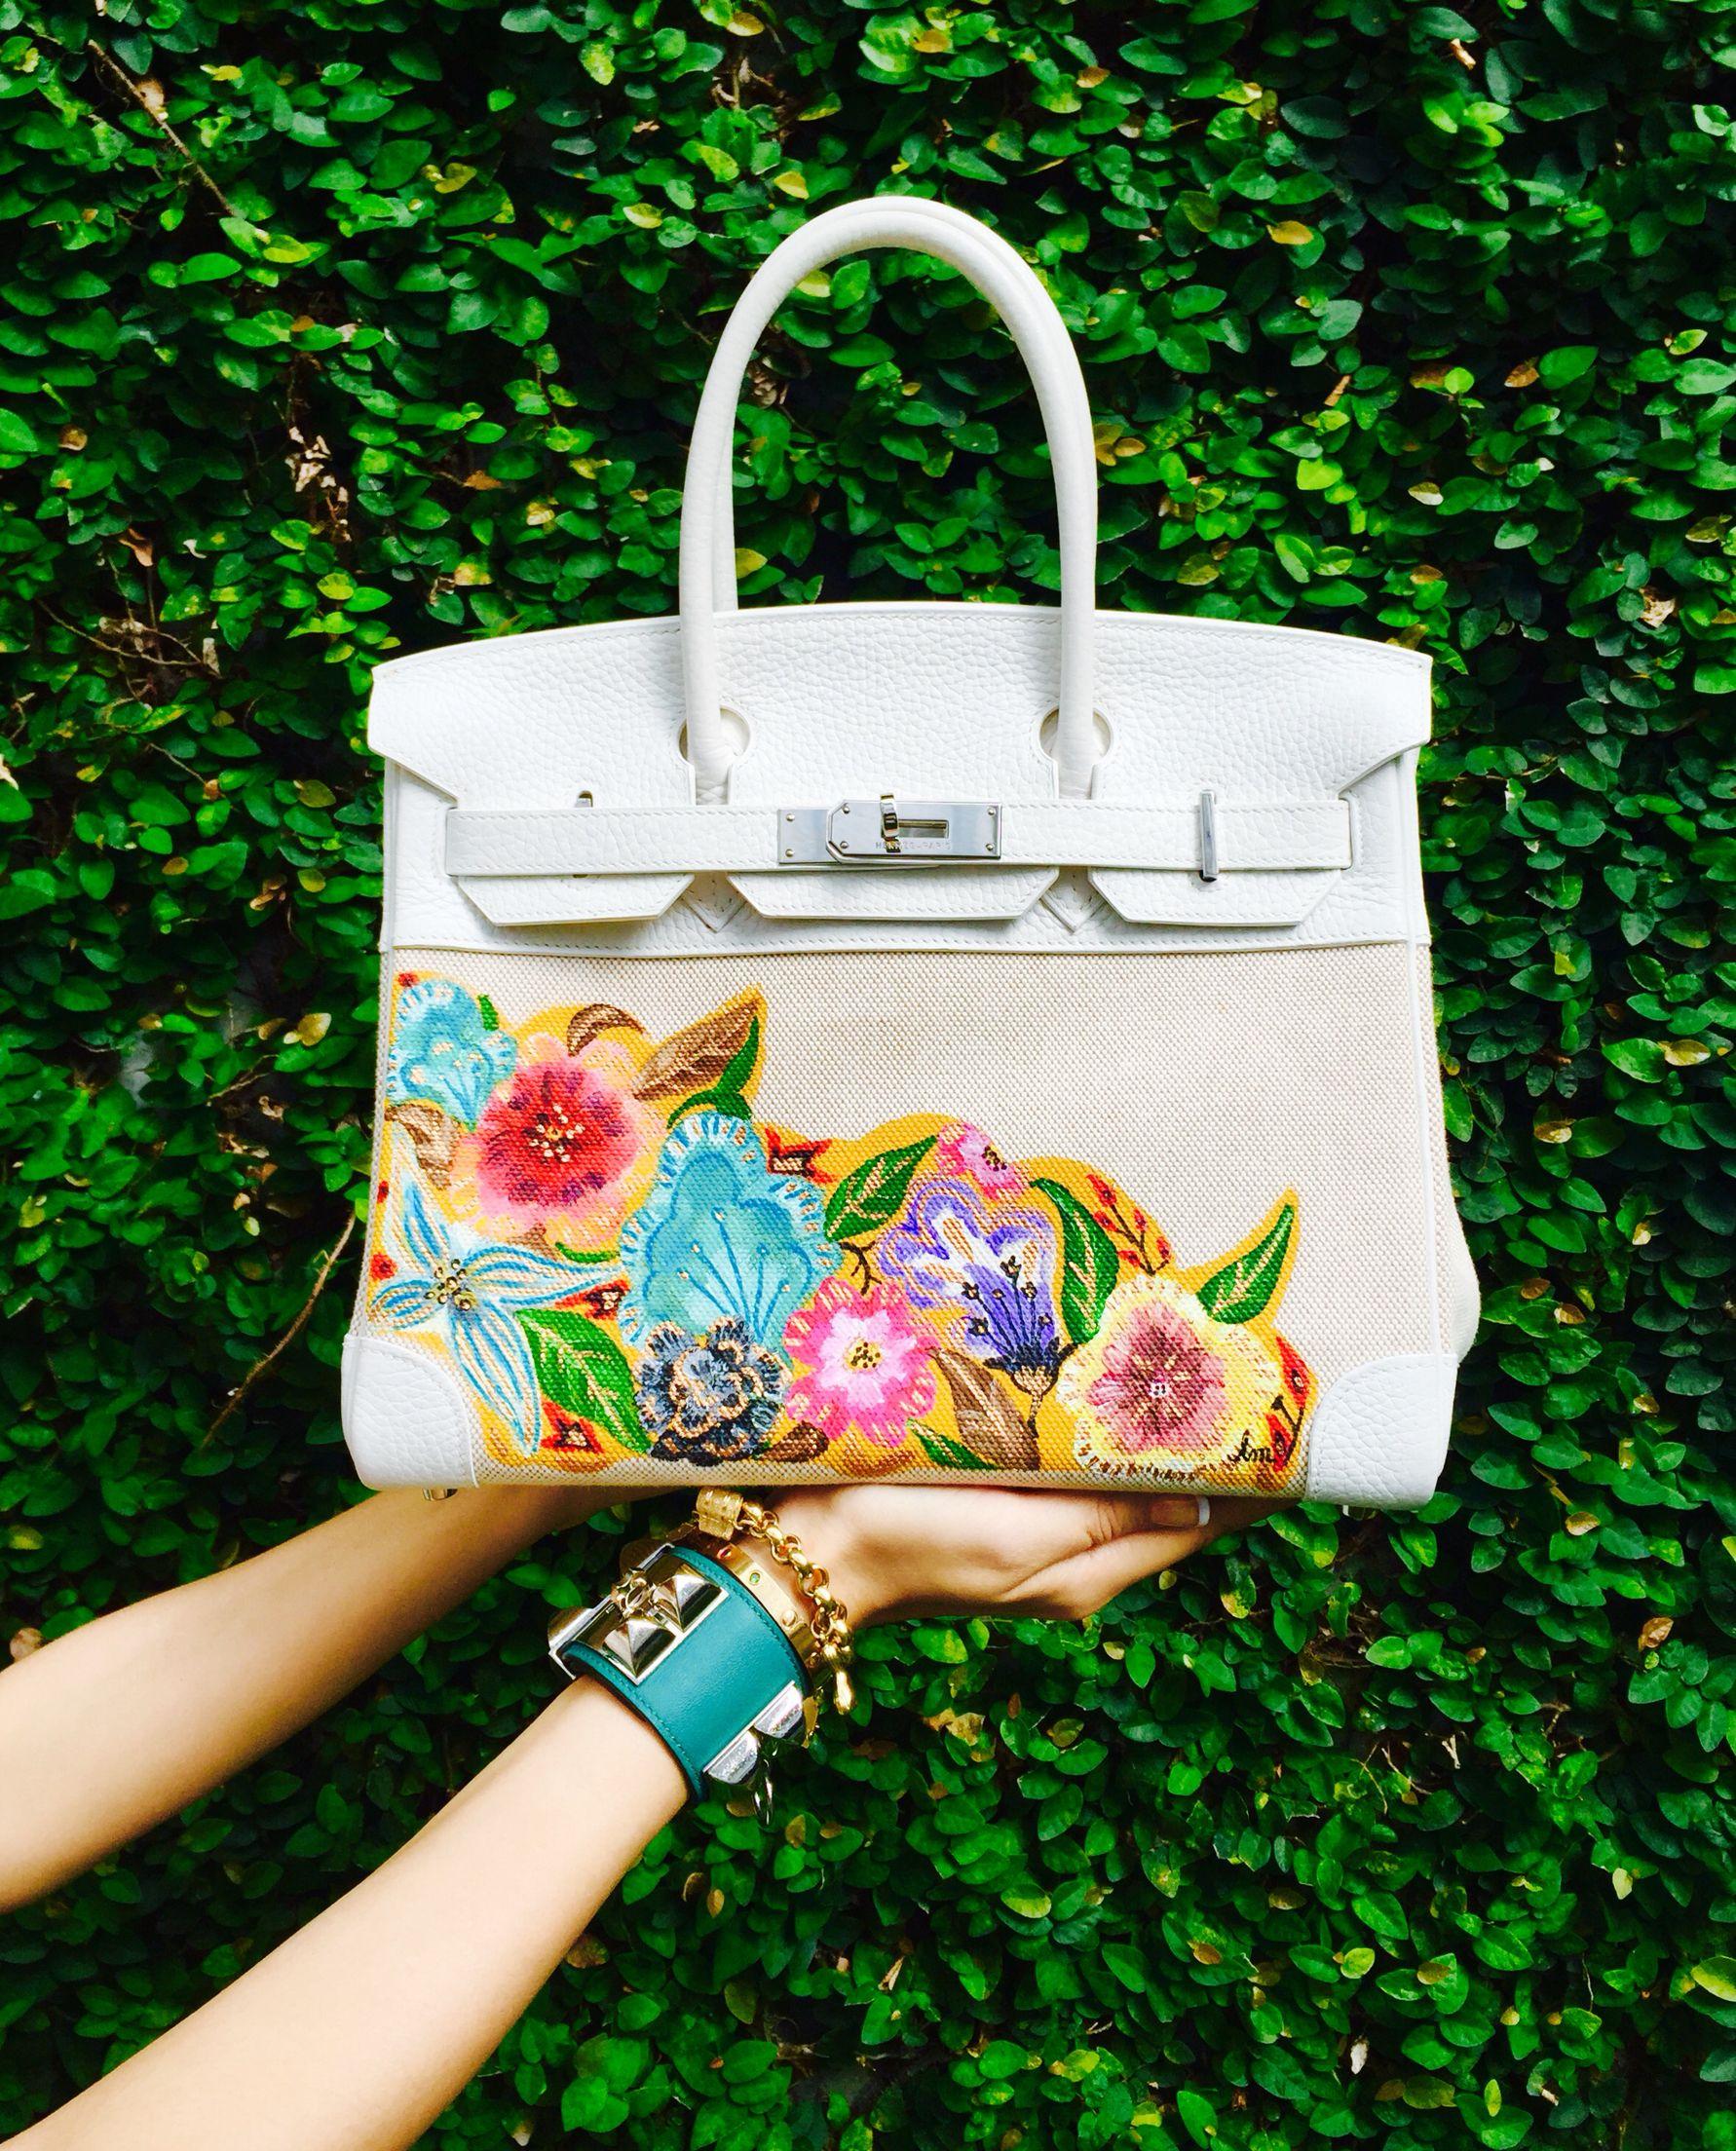 Hand Painted Hermes Birkin By Artist Love Marie Aka Heart Evangelista Escudero Painted Handbag Purses And Handbags Handpainted Bags